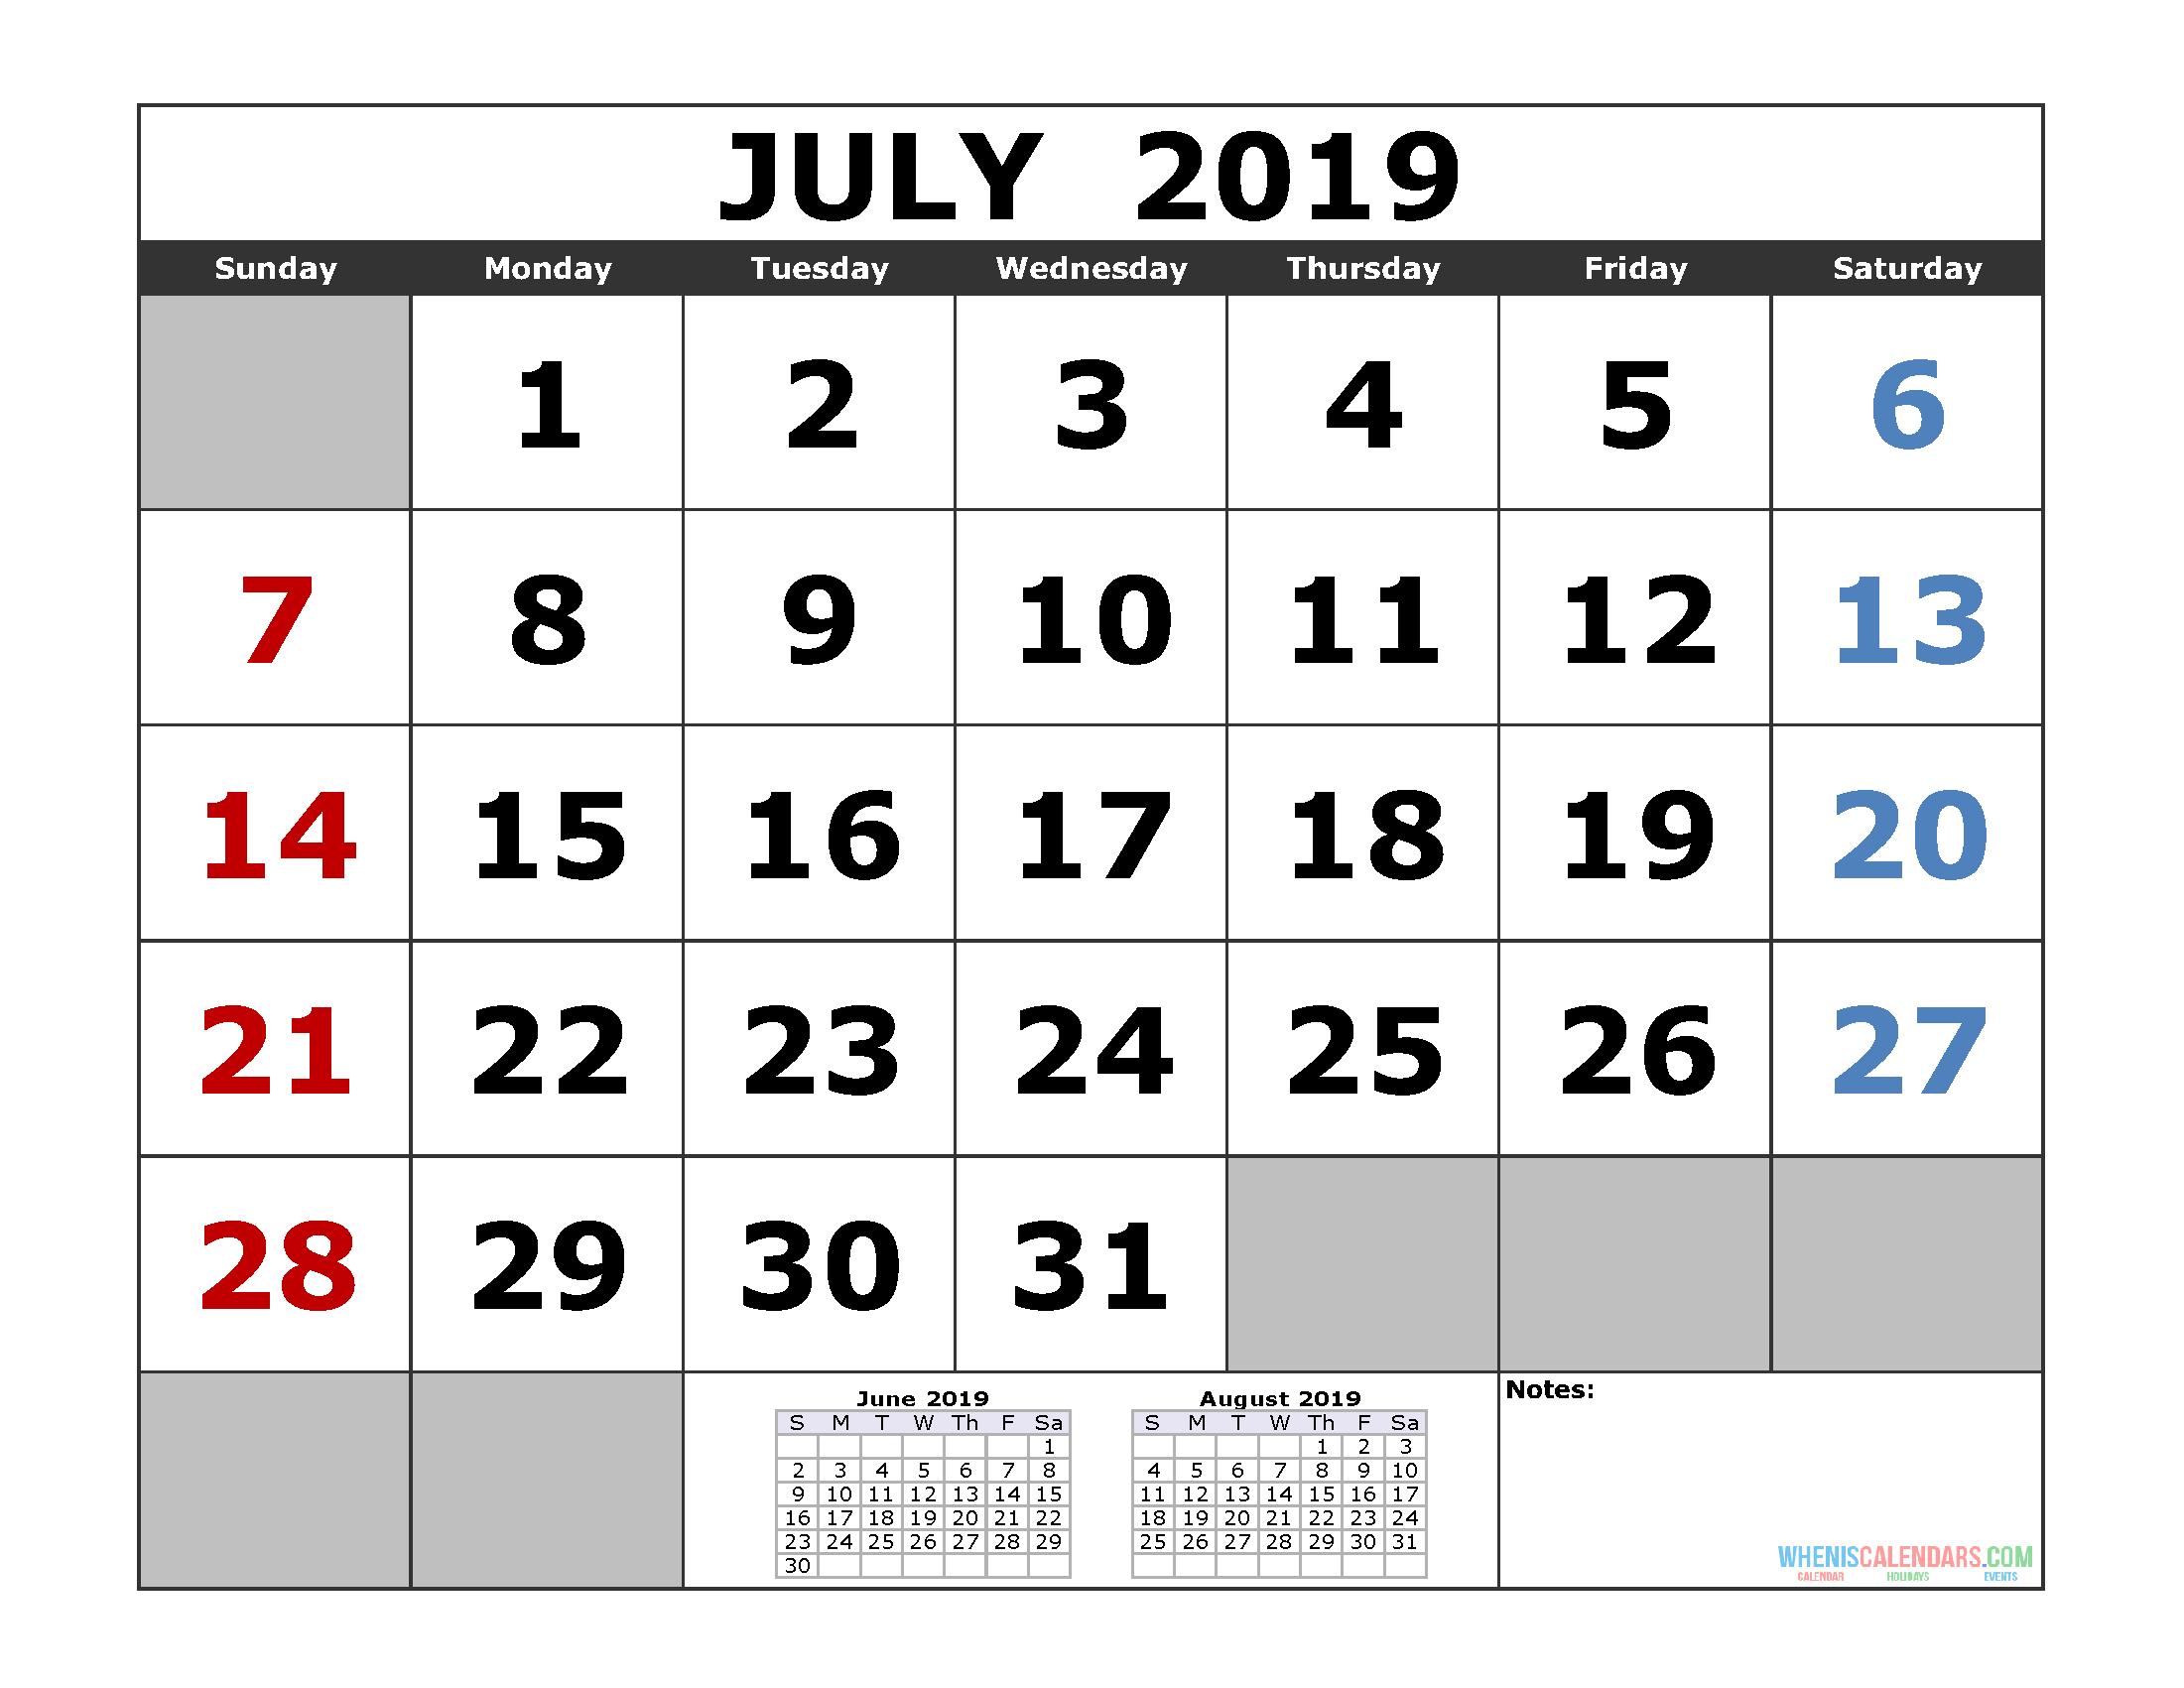 July 2019 Printable Calendar Template (3 Month Calendar) | Free July 3 2019 Calendar